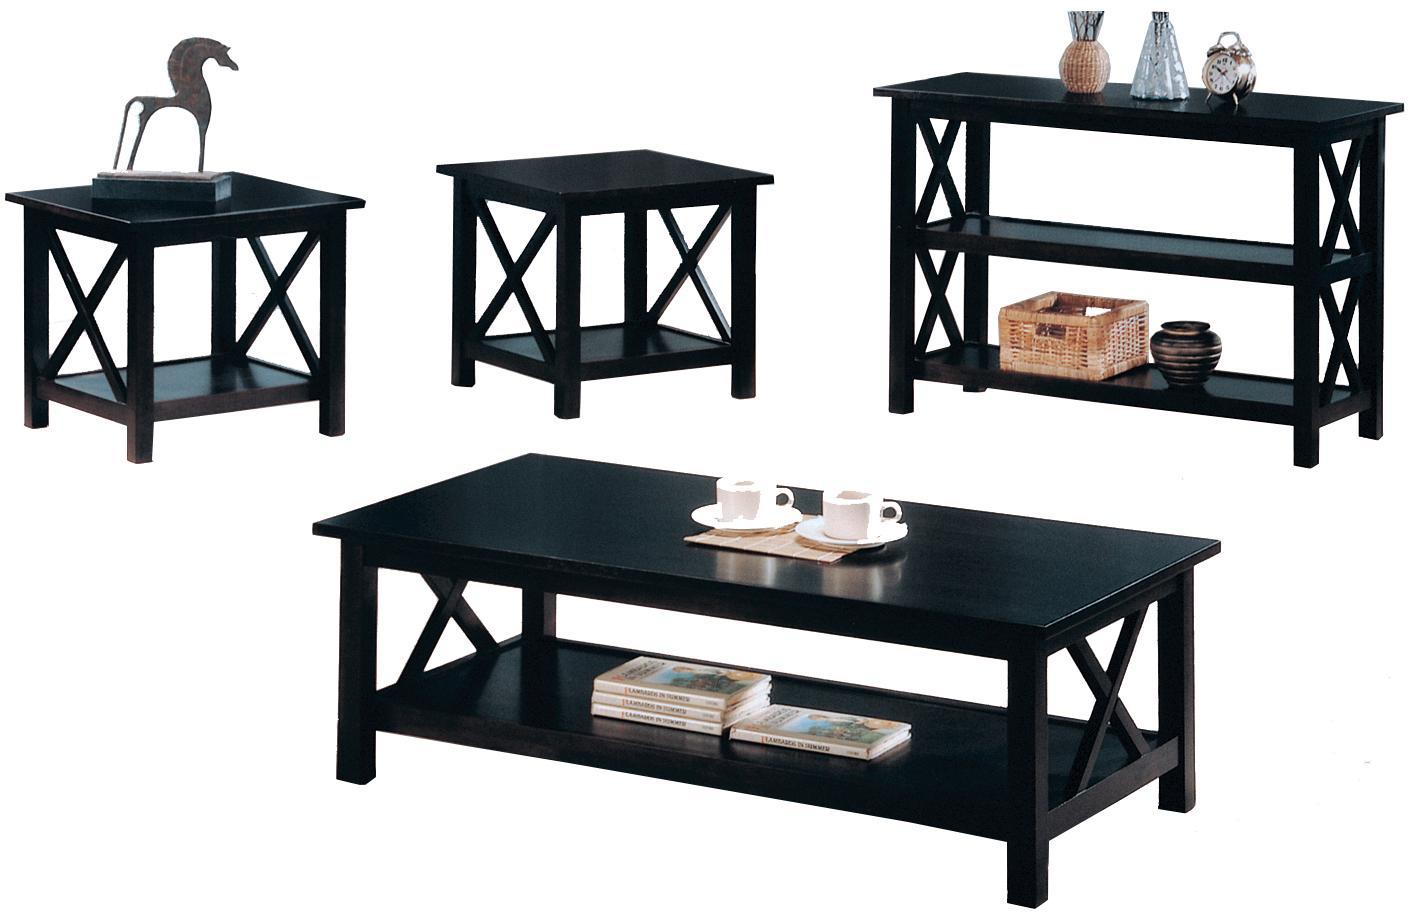 Black coffee table set -  Coaster Briarcliff Casual 3 Piece Occasional Table Set Coaster Fine Furniture 31 Singular Coffee